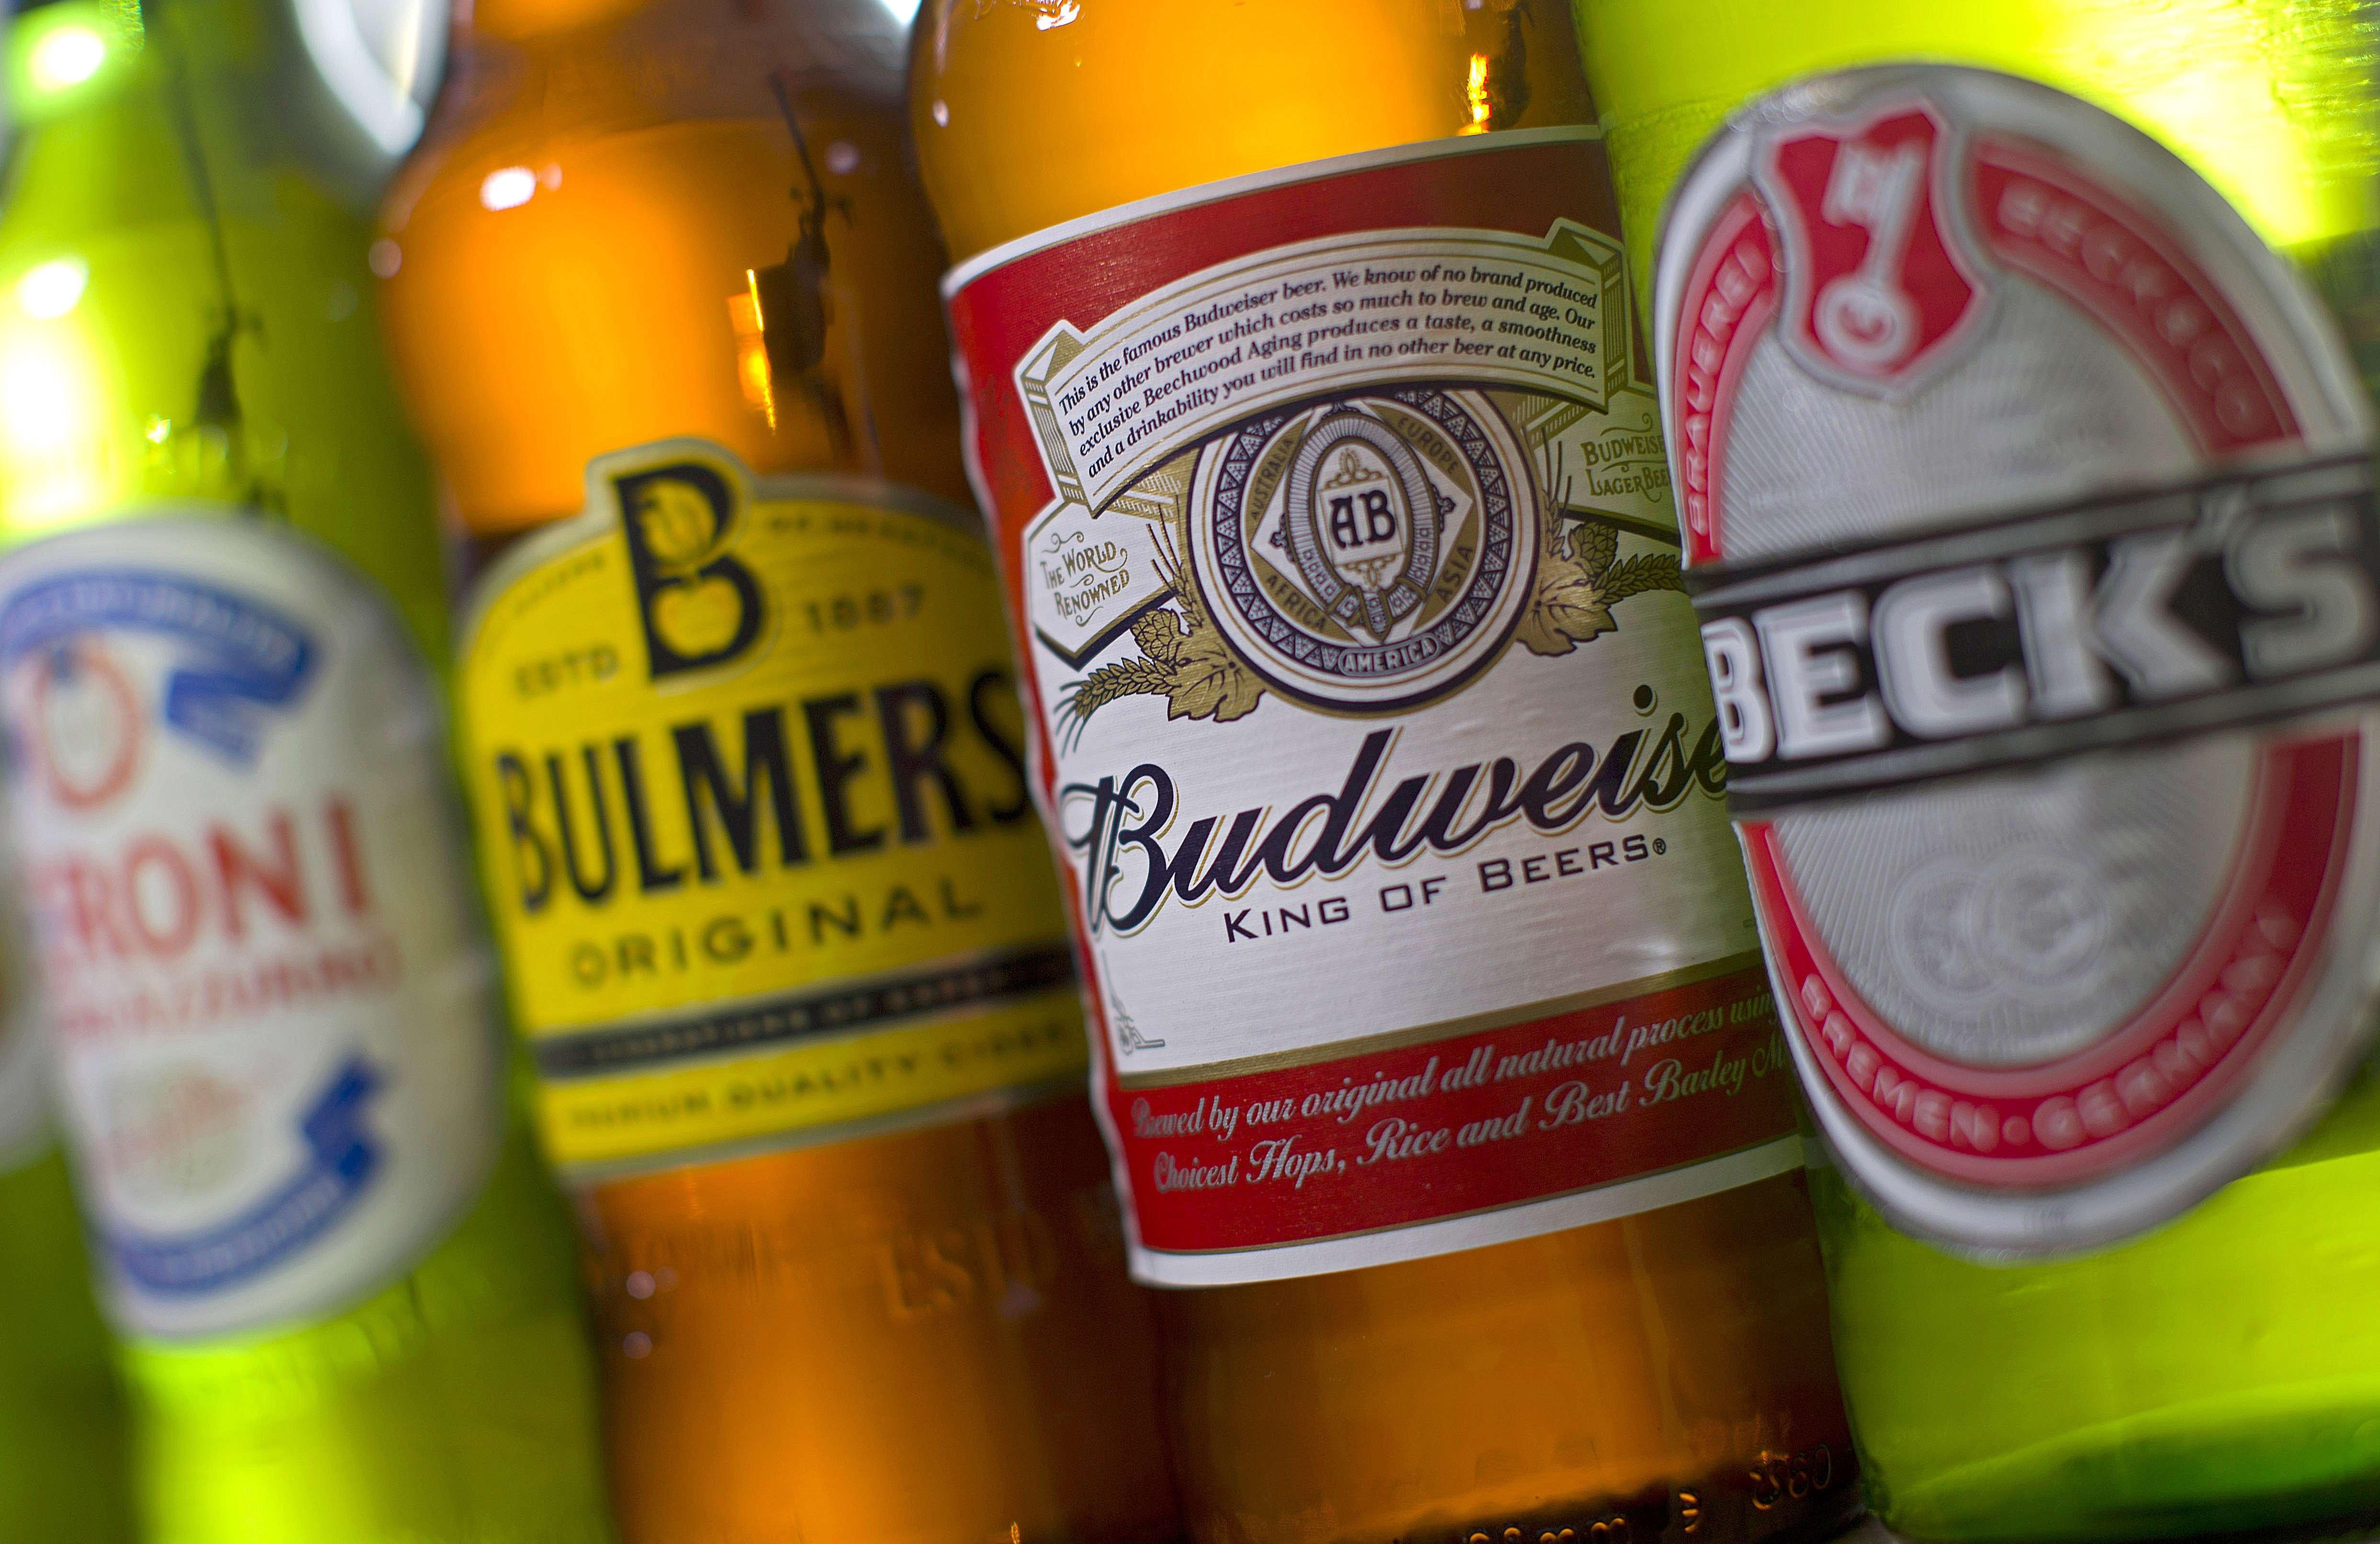 Medium-Size Beer Brewers